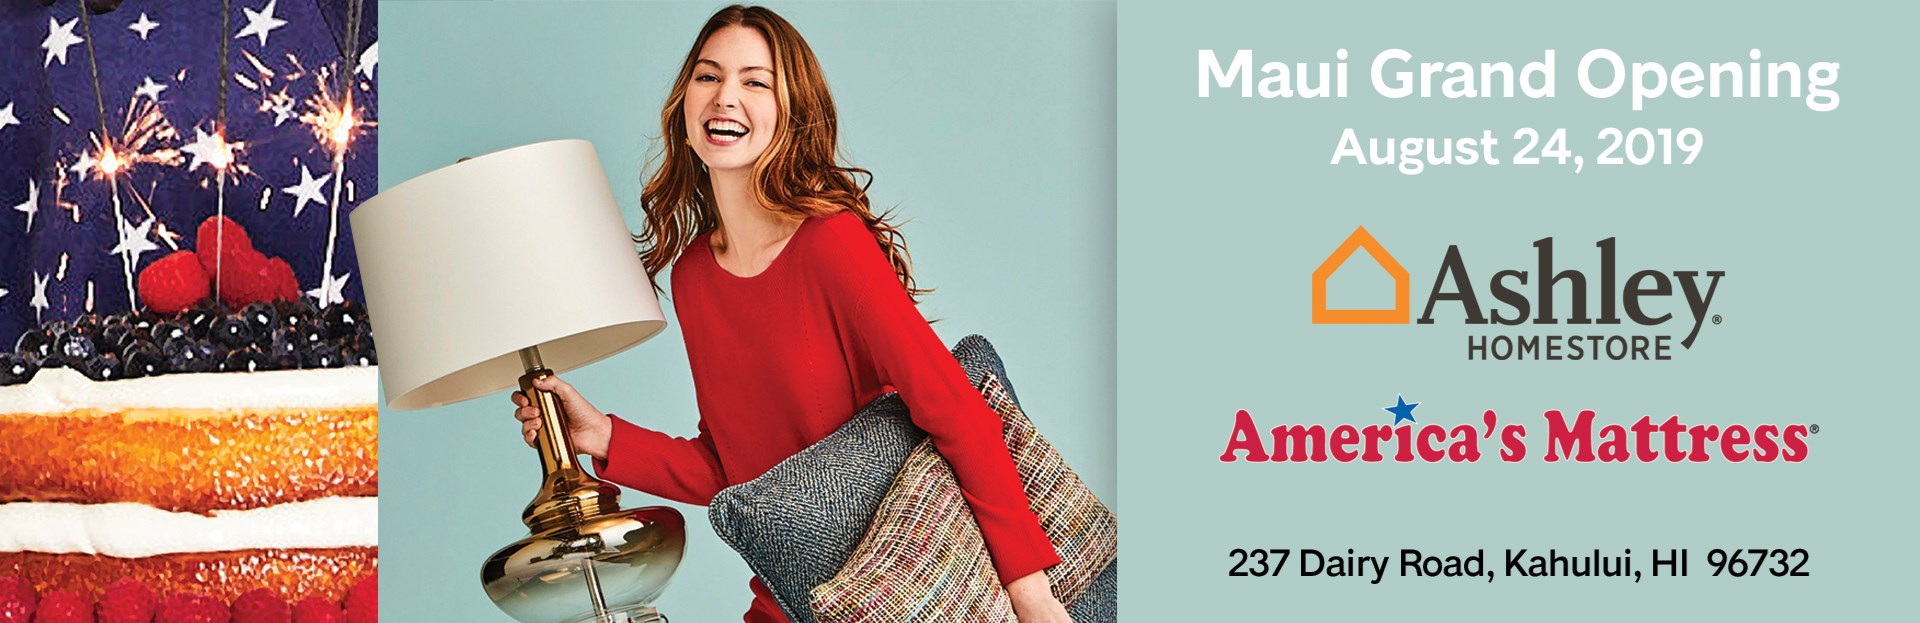 Ashley HomeStore and America's Mattress Grand Opening August 24 2019